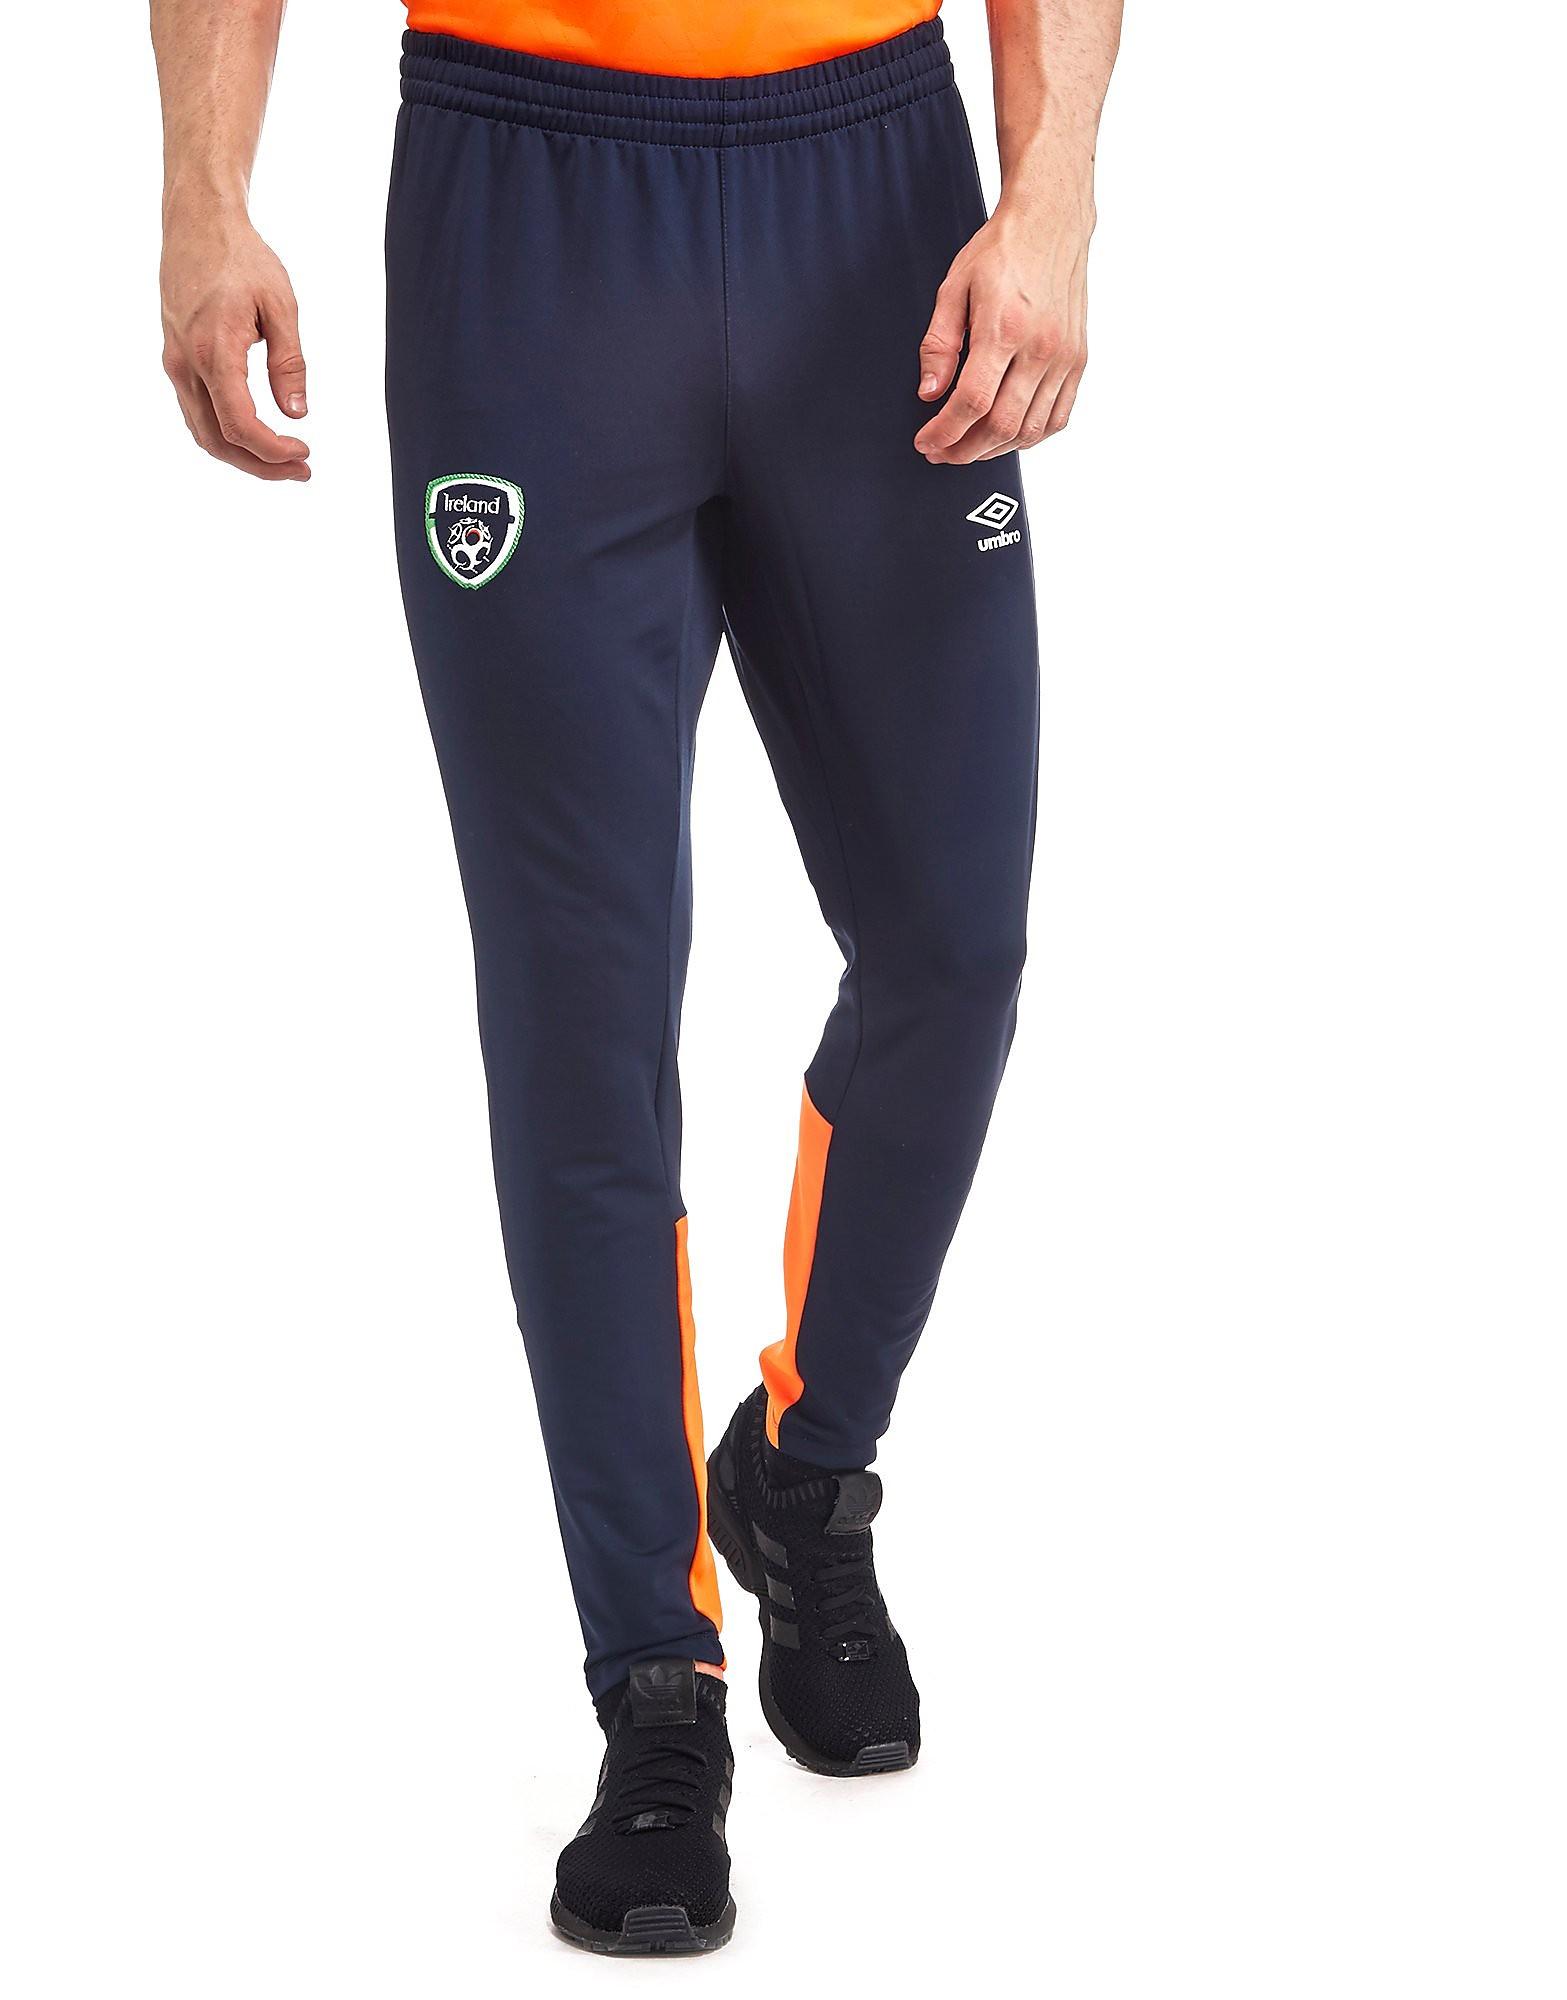 Umbro Republic of Ireland Training Pants